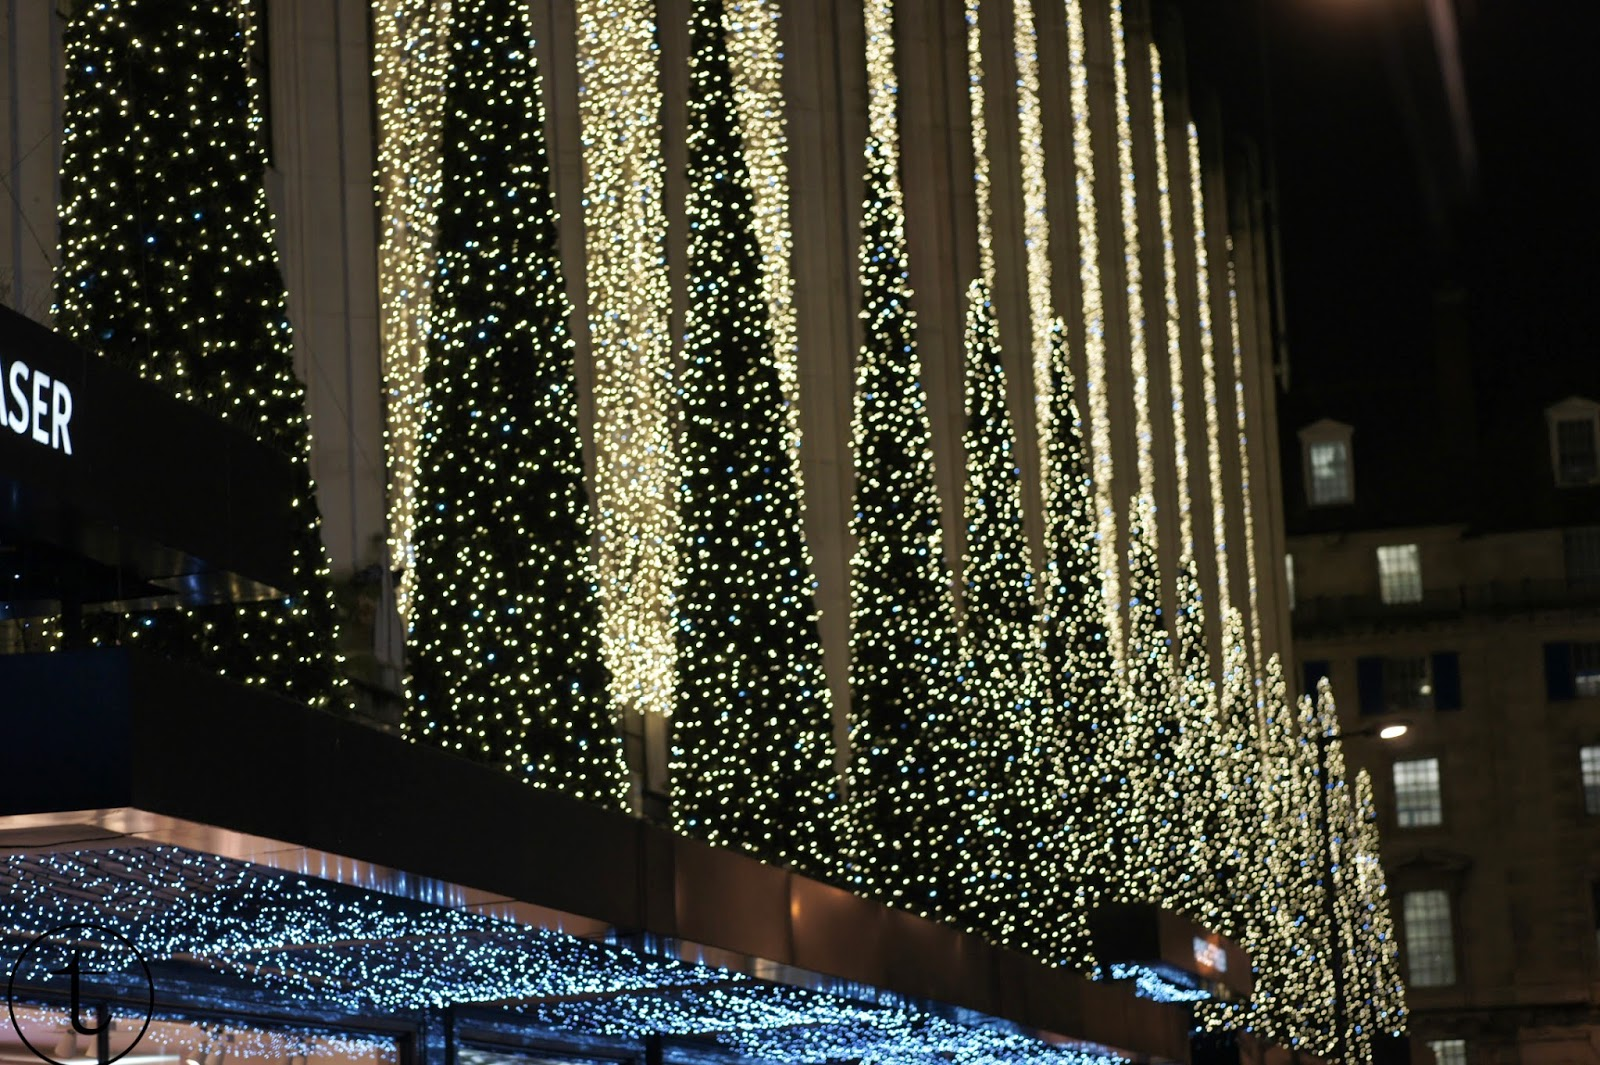 house of fraser christmas decoration